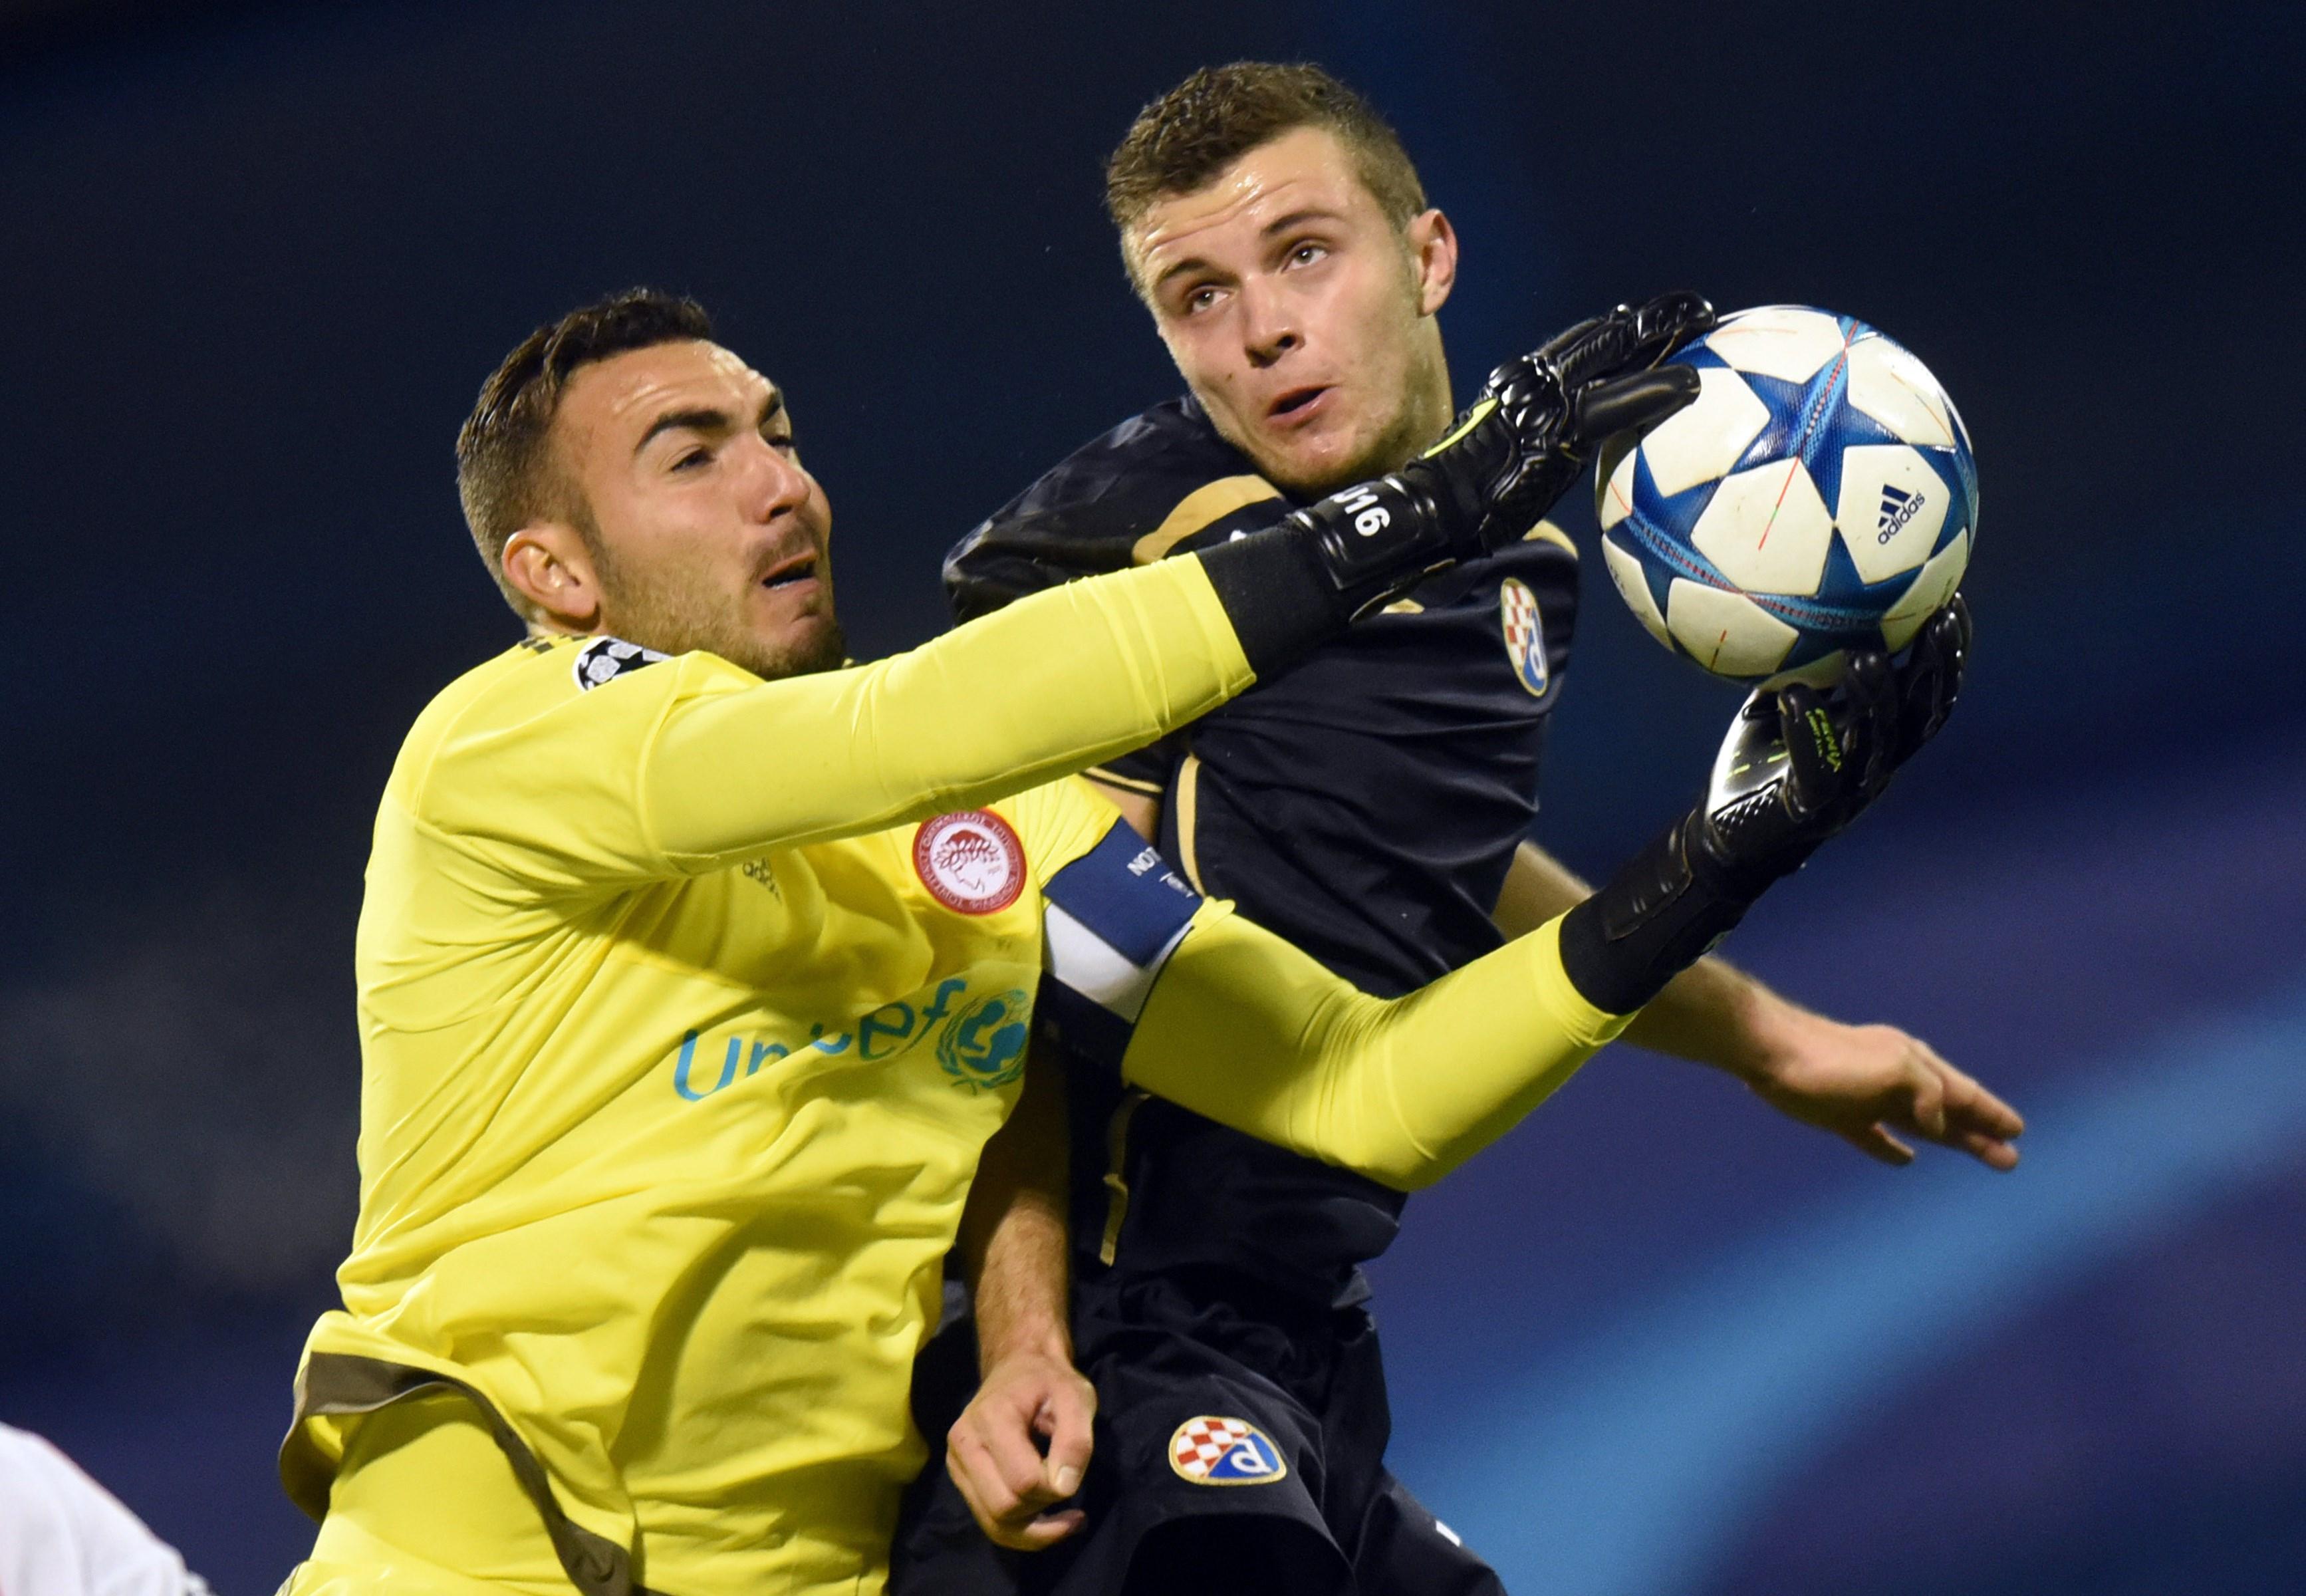 Aston Villa target transfer of Dinamo Zagreb's Armin Hodzic – report